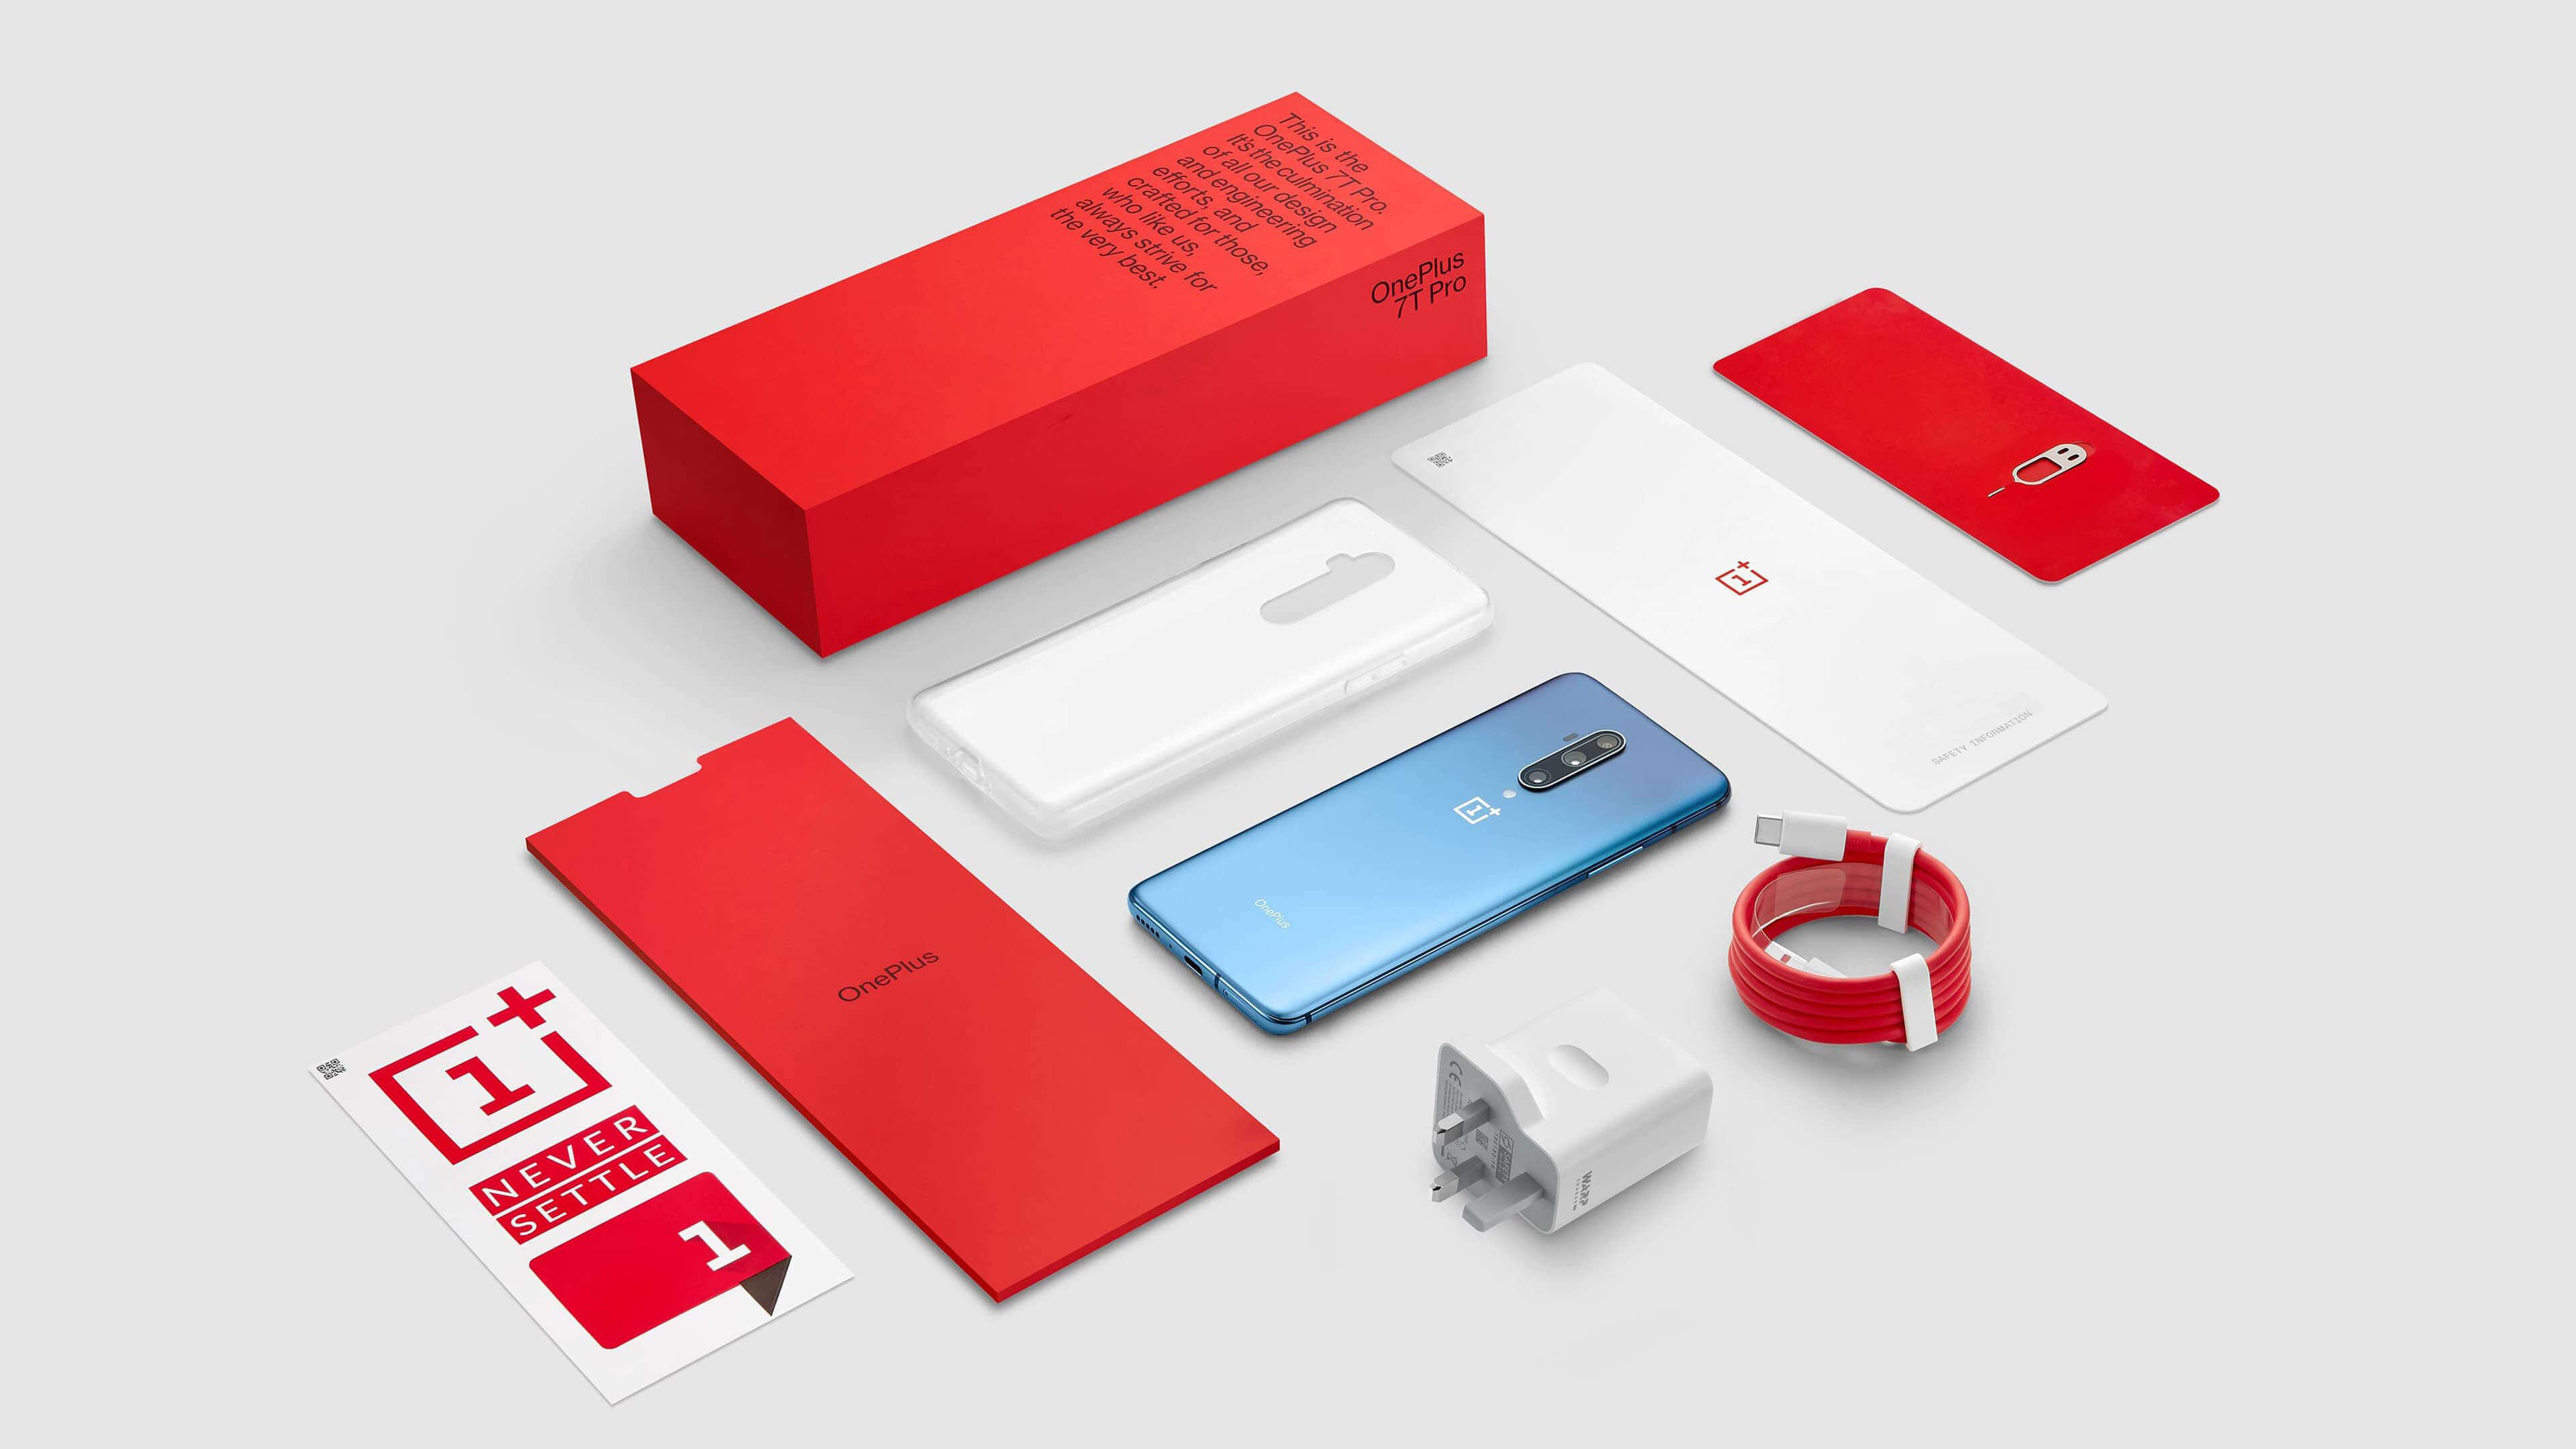 OnePlus 借由 OnePlus 7T 系列诠释对速度的追求 14